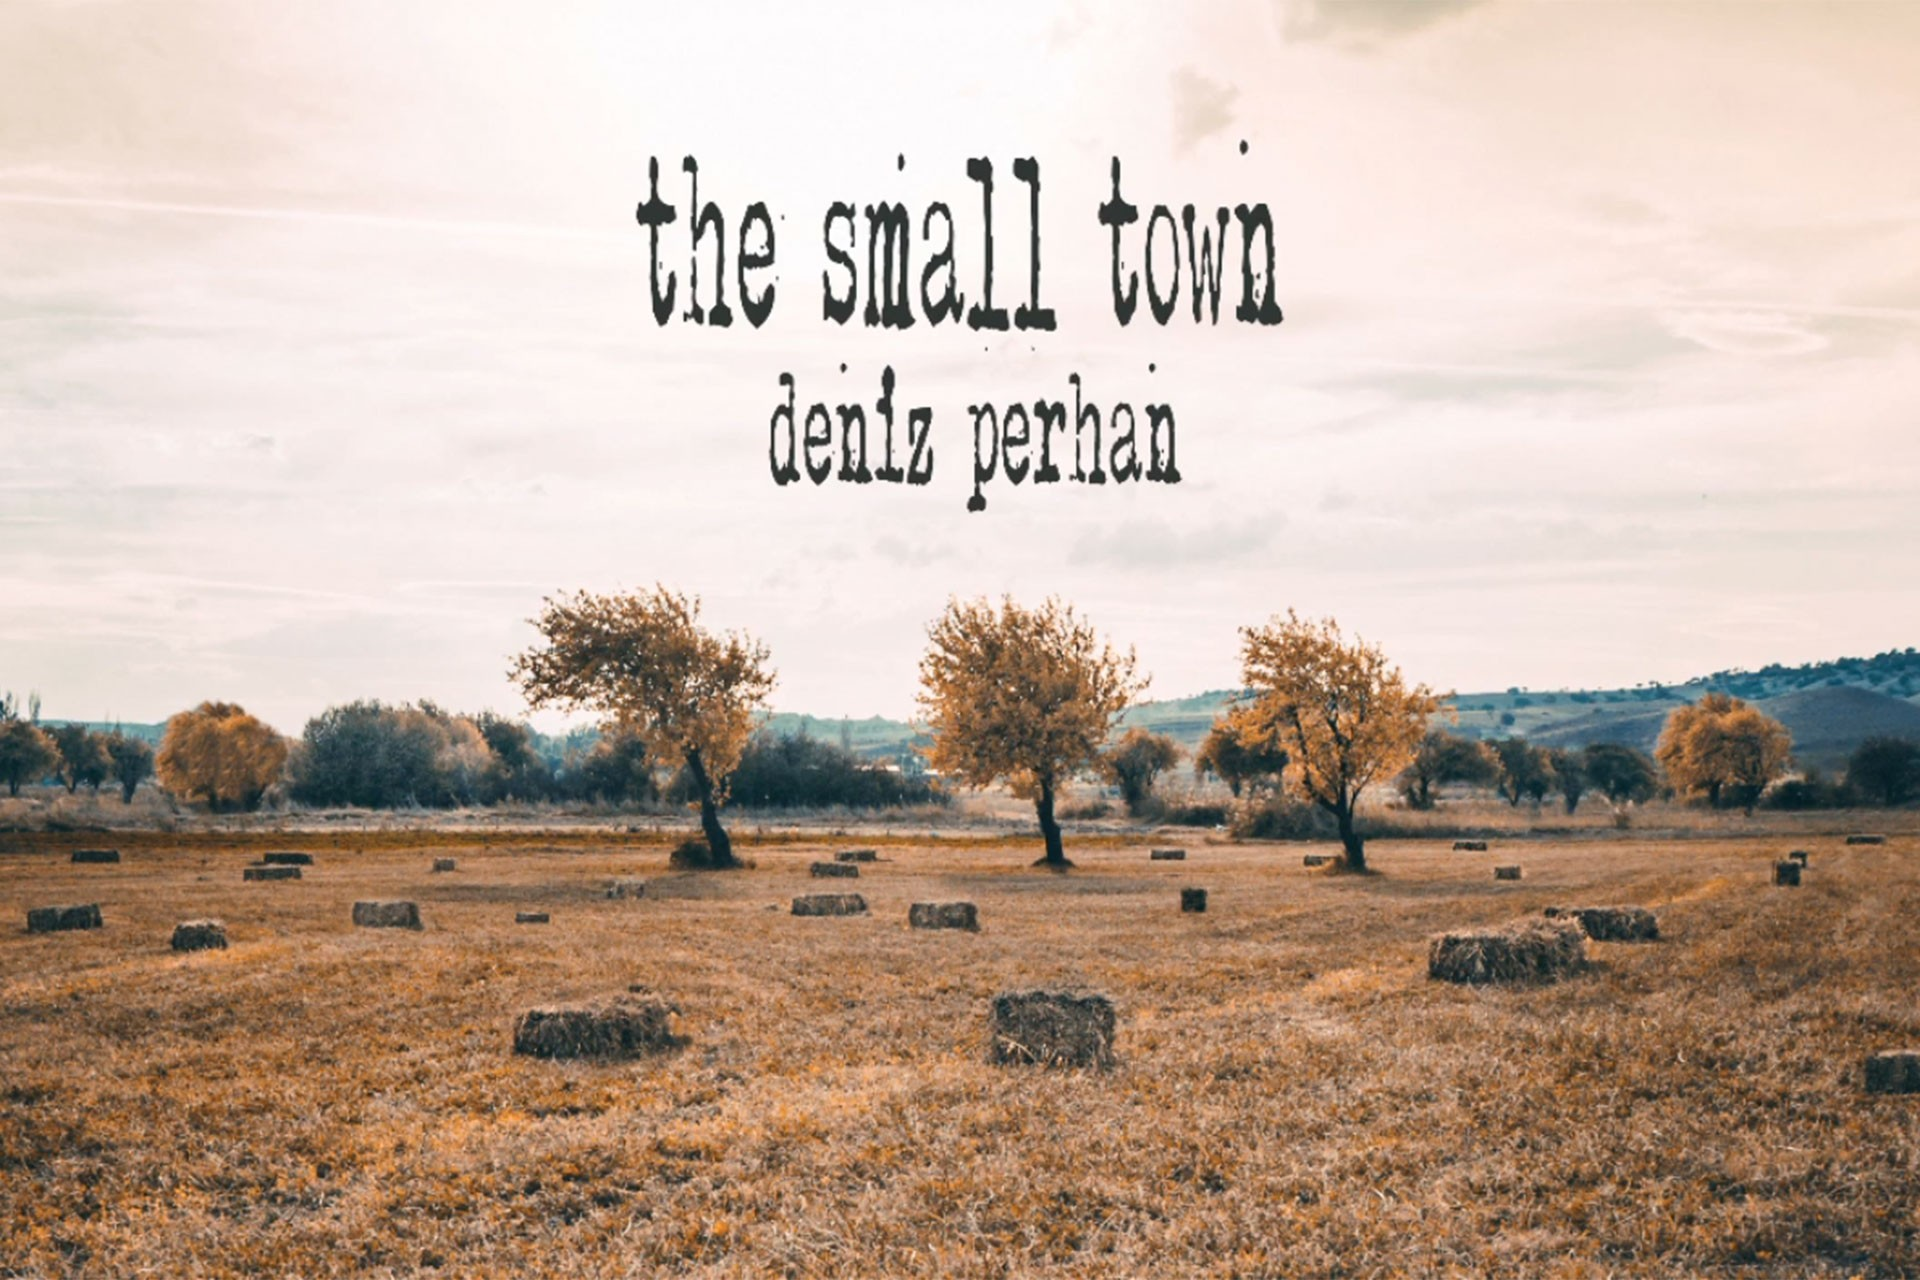 Deniz Perhan'dan kasaba esintisi: The Small Town